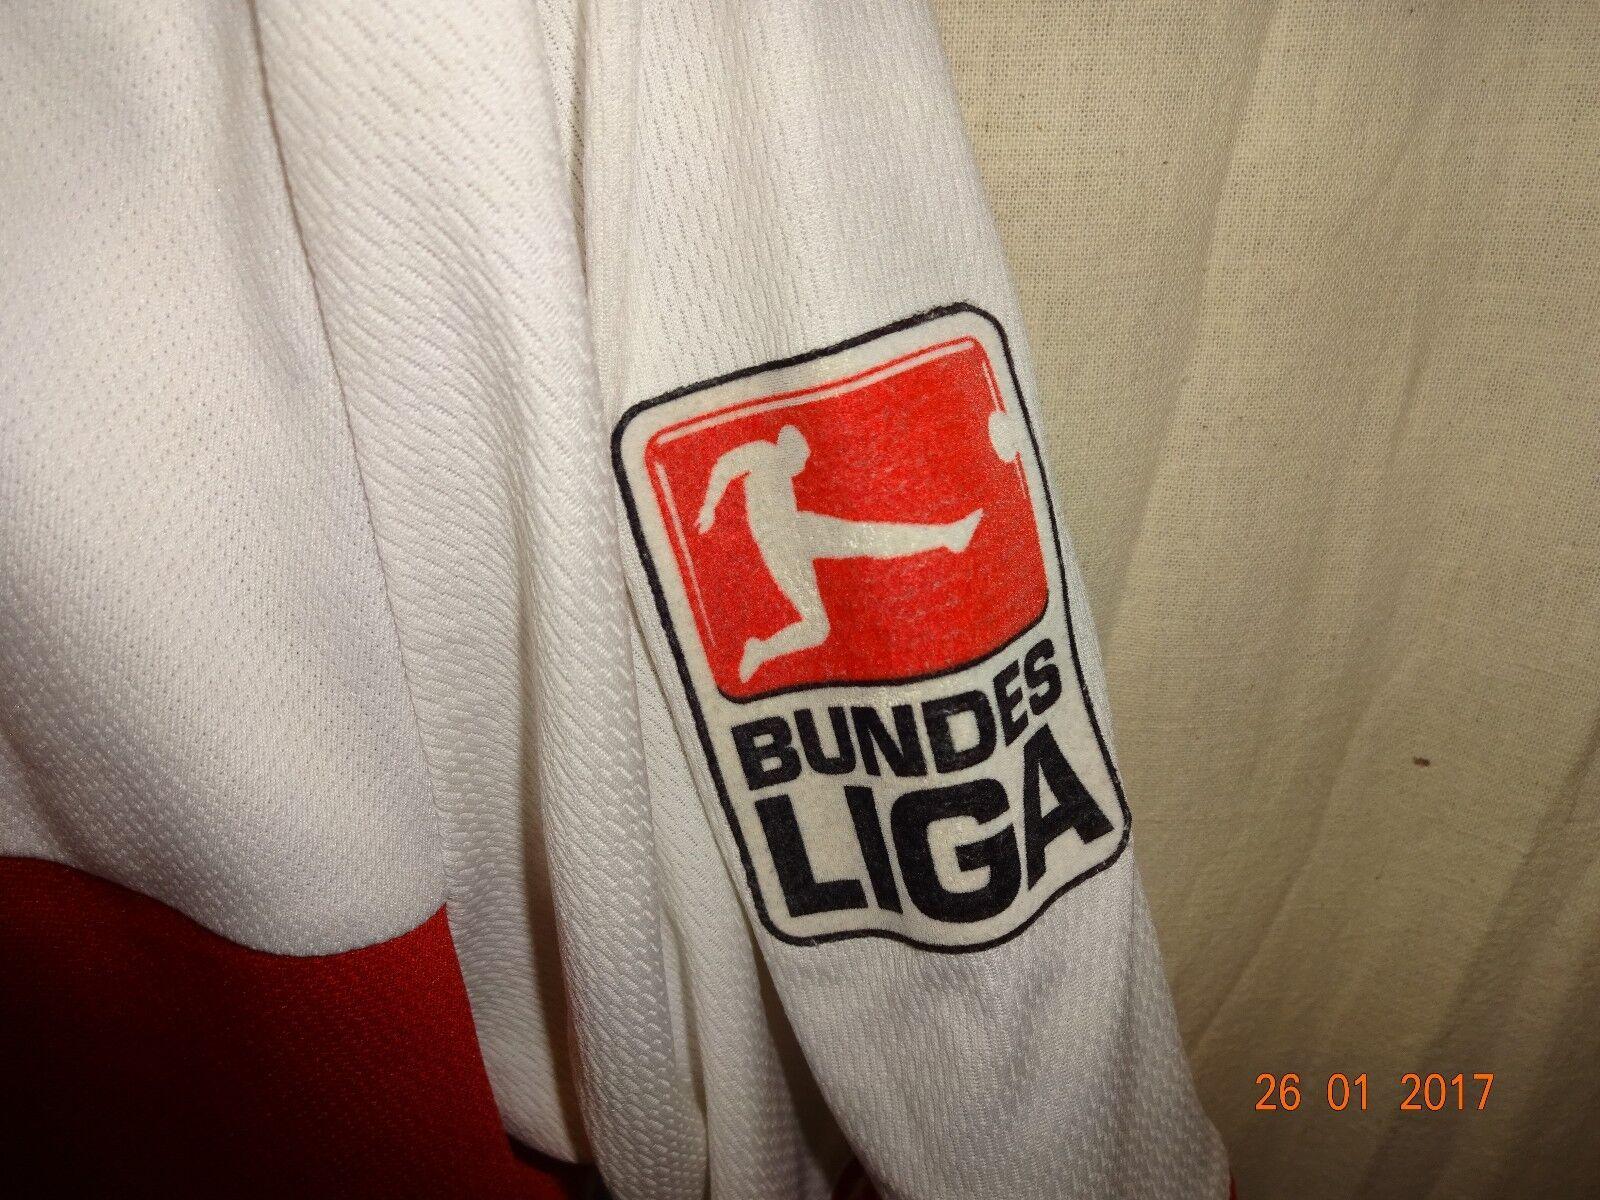 VfB Stuttgart Original Puma Heim Trikot 2009/10